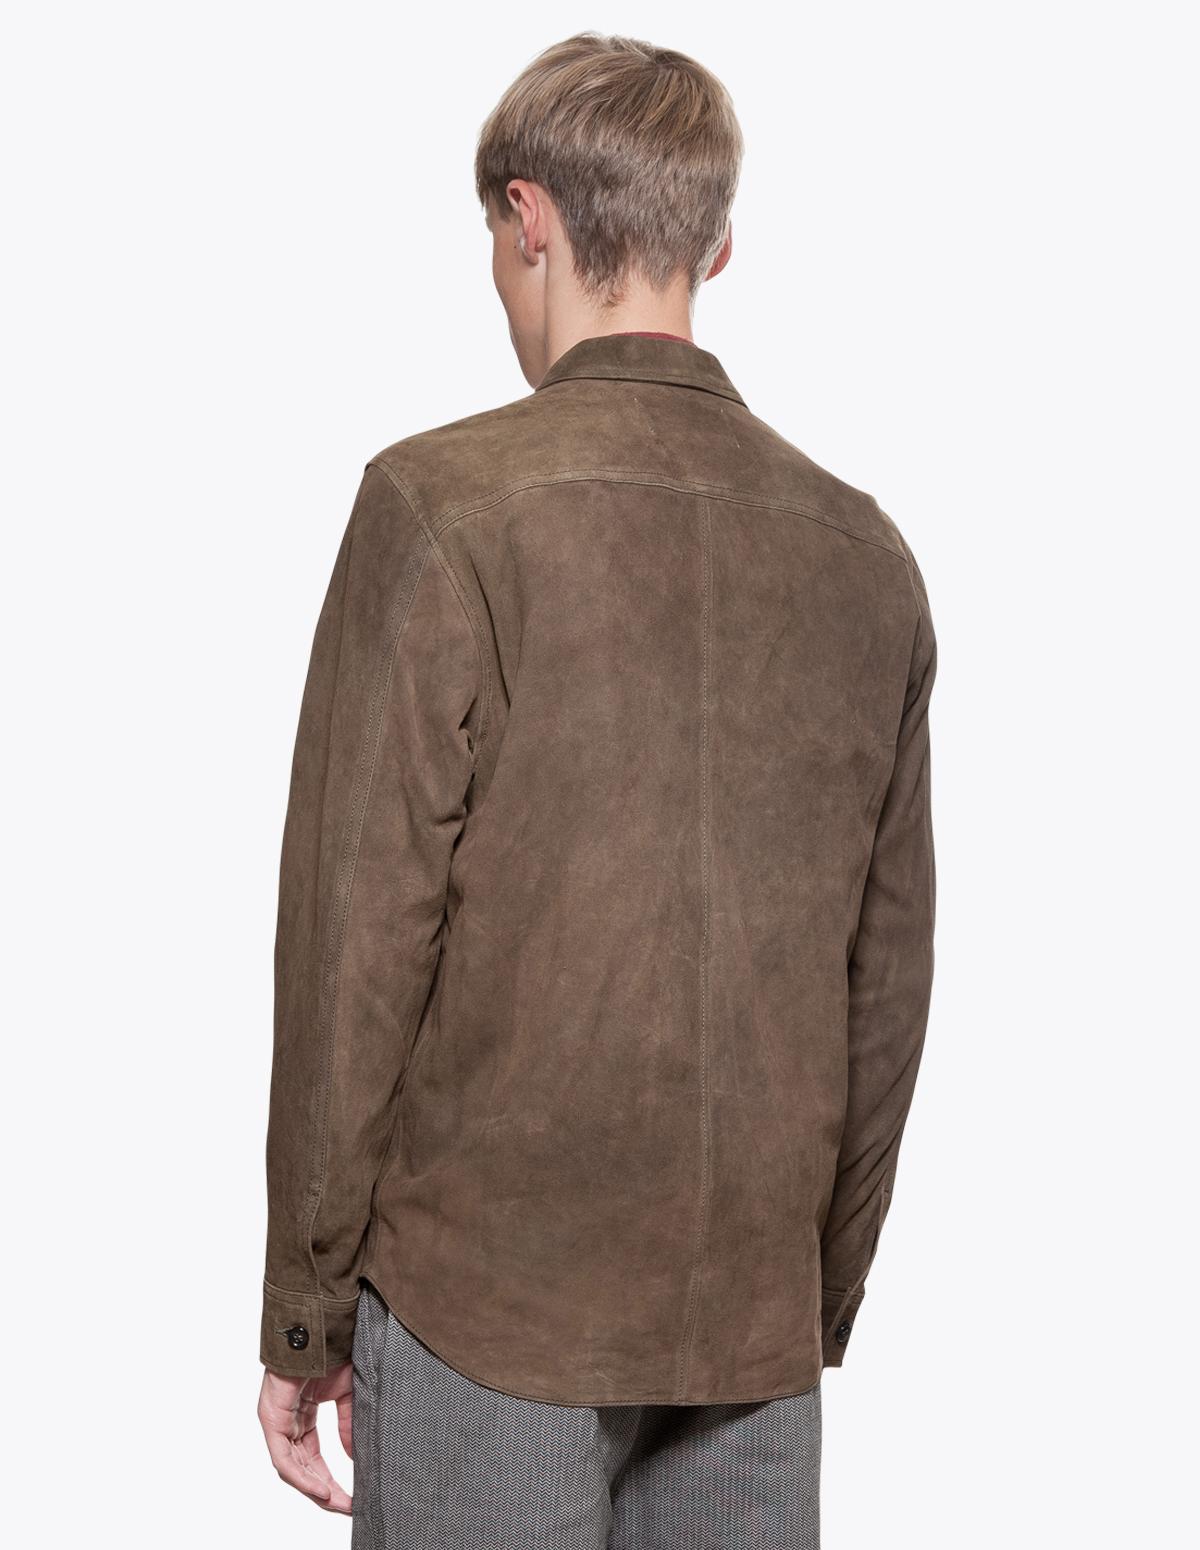 ol-shirt-suade-brown003.jpg